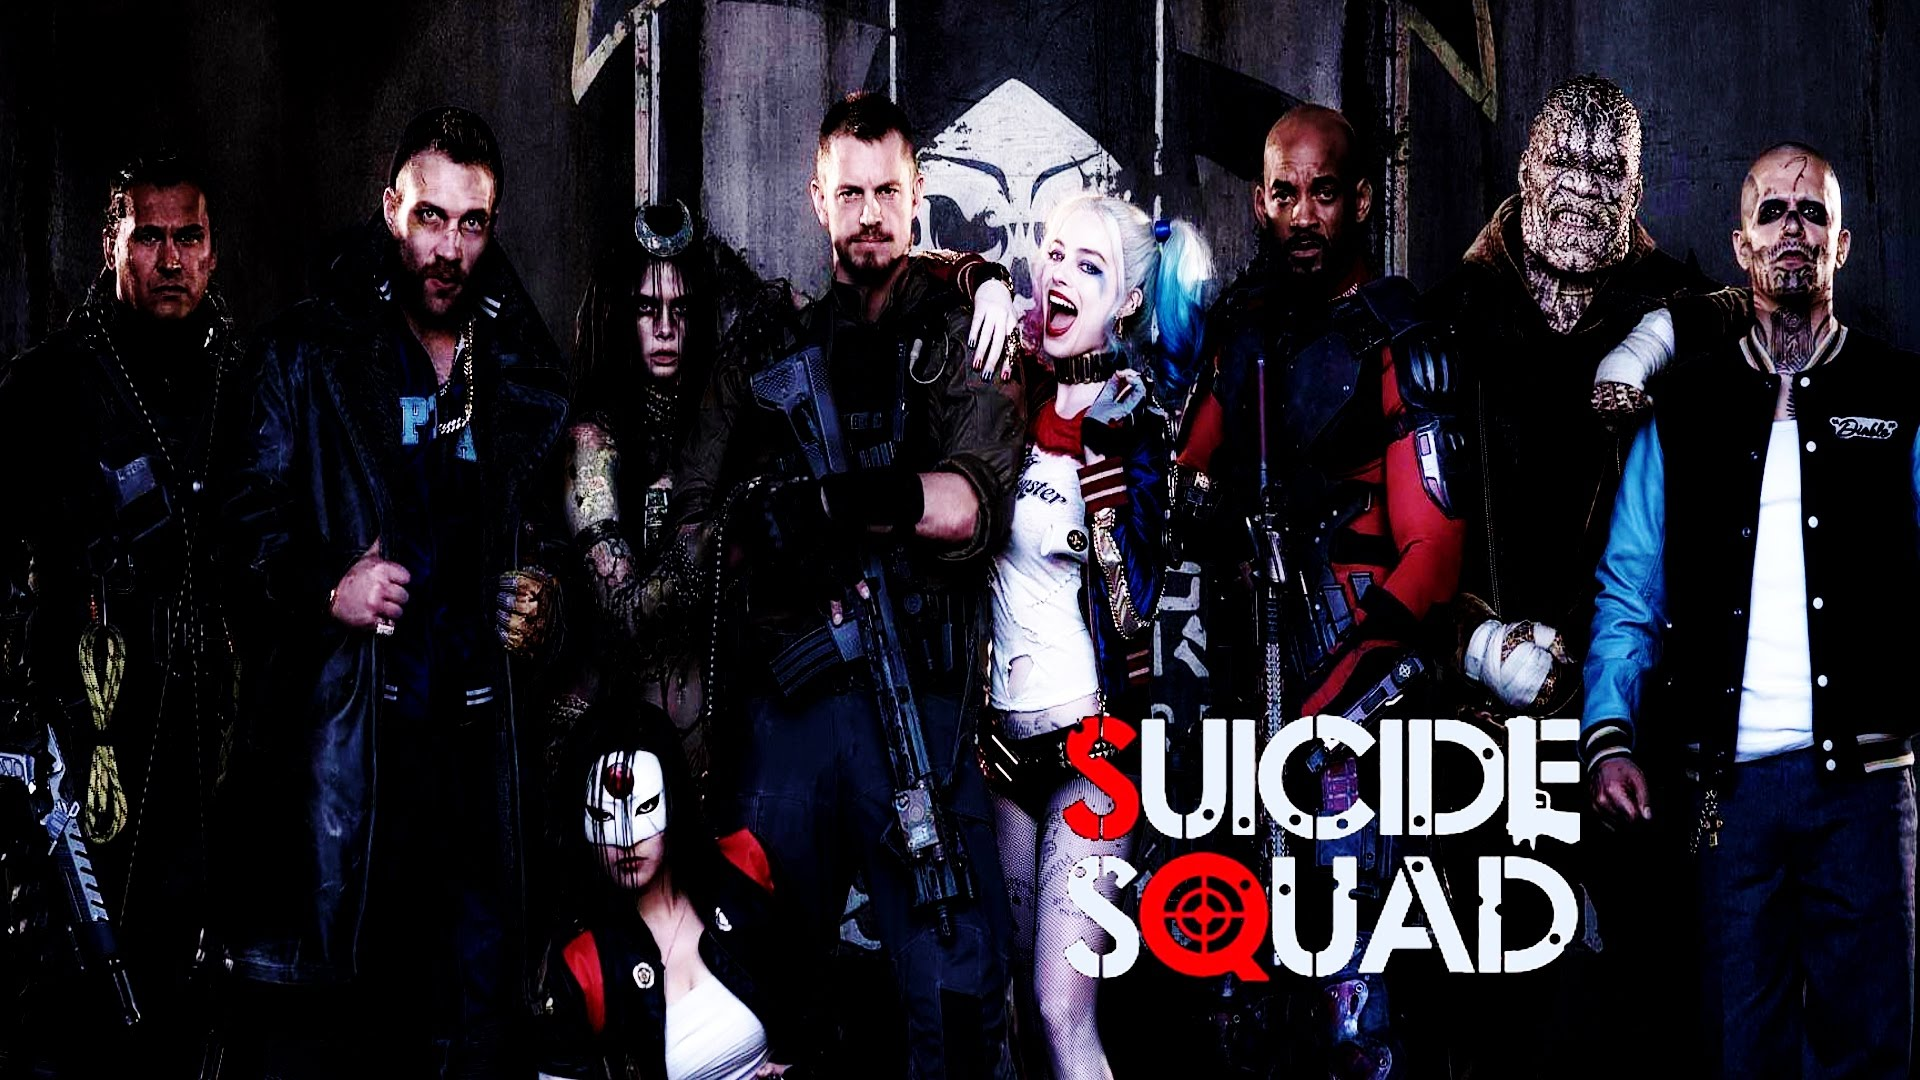 Suicide Squad 2016 1920x1080